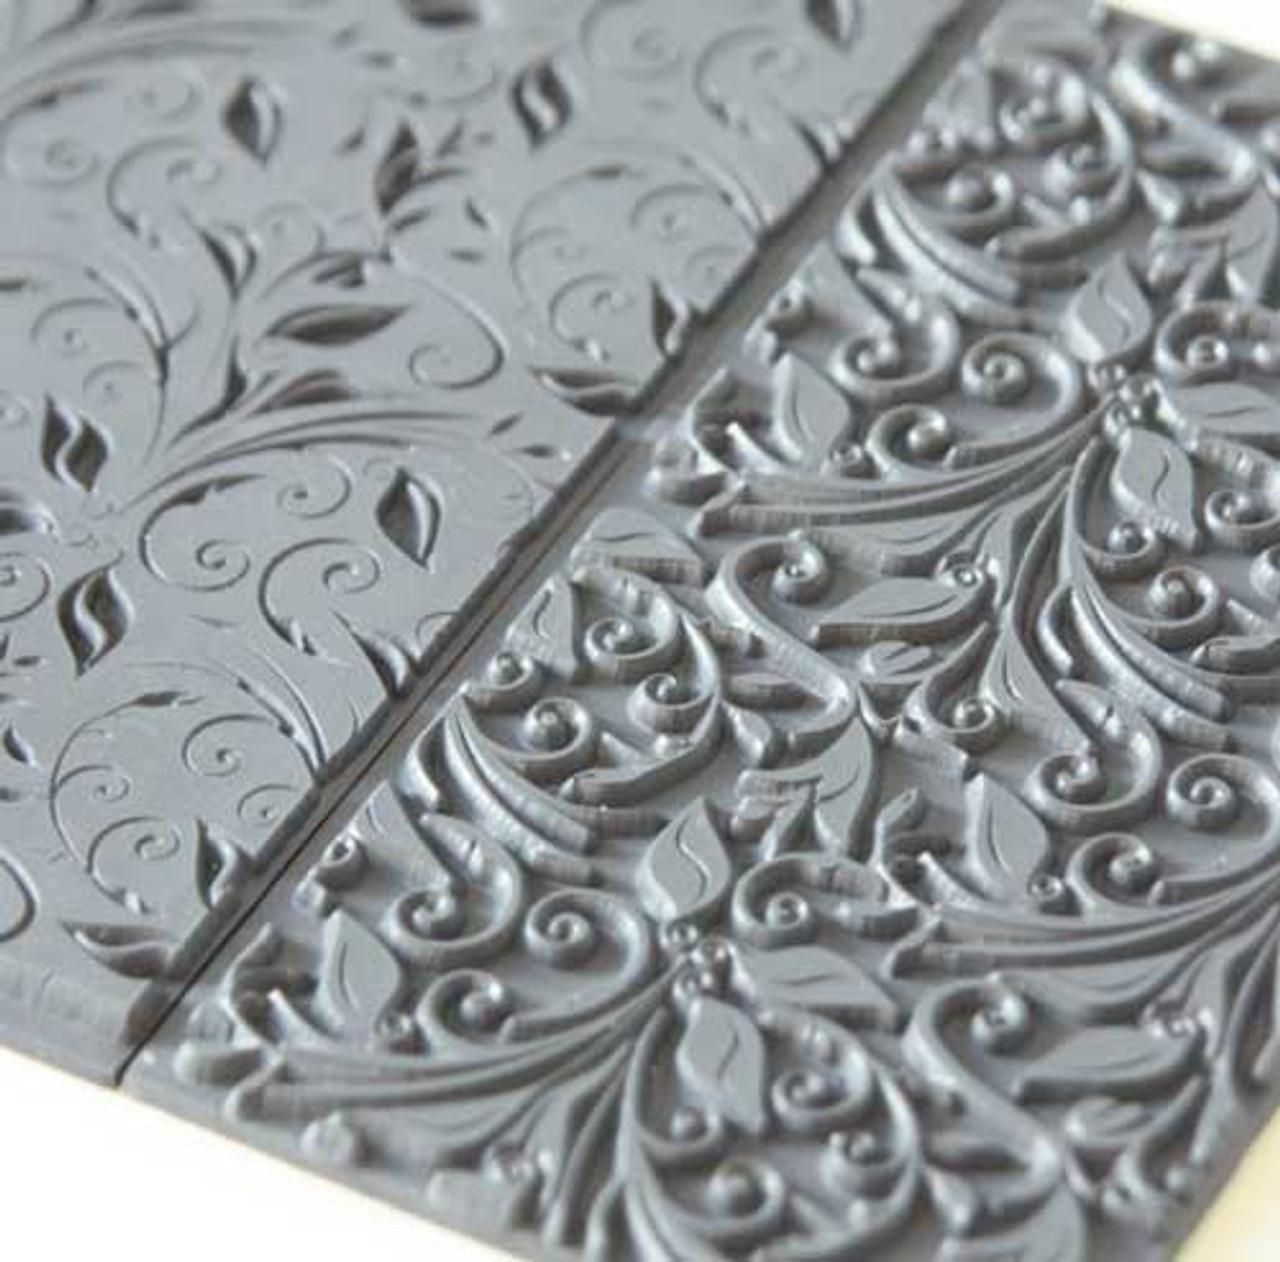 Texture Tile - Leaves & Tendrils (TTL-621) is on the right, next to Texture Tile - Leaves & Tendrils Fine Line Embossed (TTL-622) on the left.